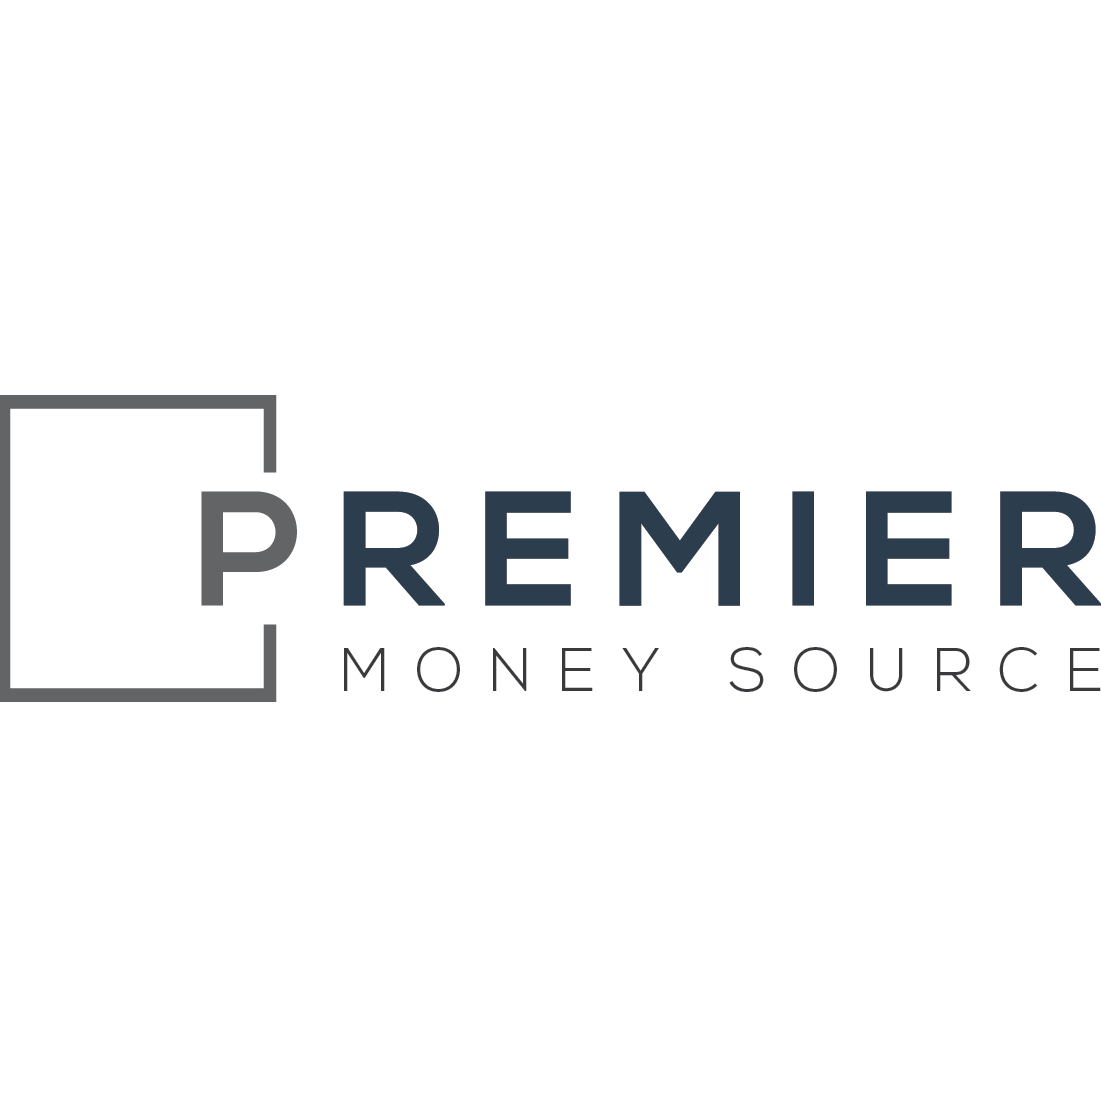 Premier Money Source, Inc - Newport Coast, CA - Mortgage Brokers & Lenders